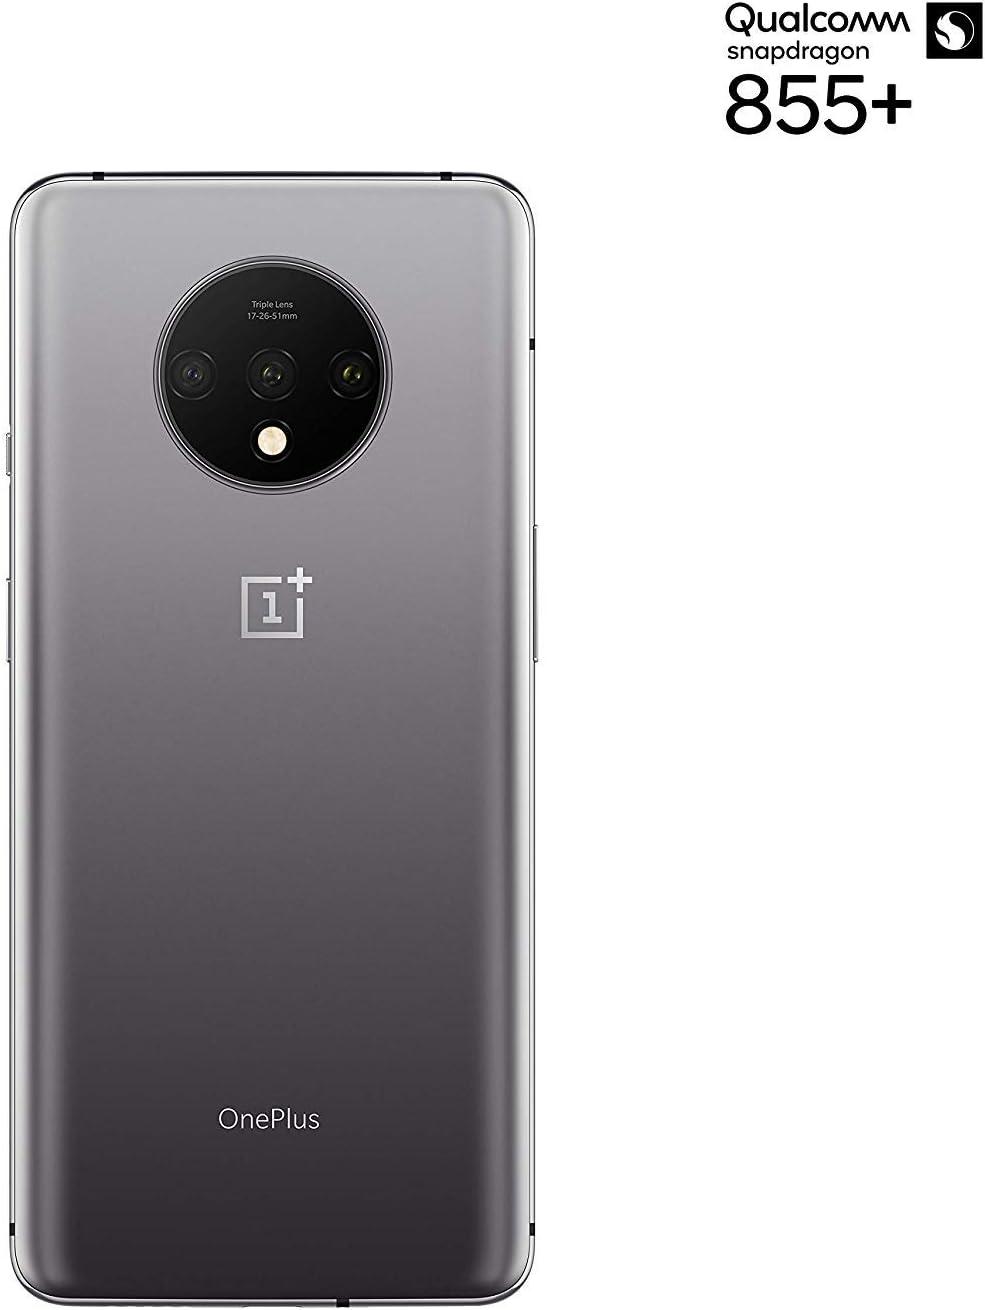 OnePlus-Smartphone entsperrt 7T 4G 6,55 Zoll: Amazon.es: Electrónica